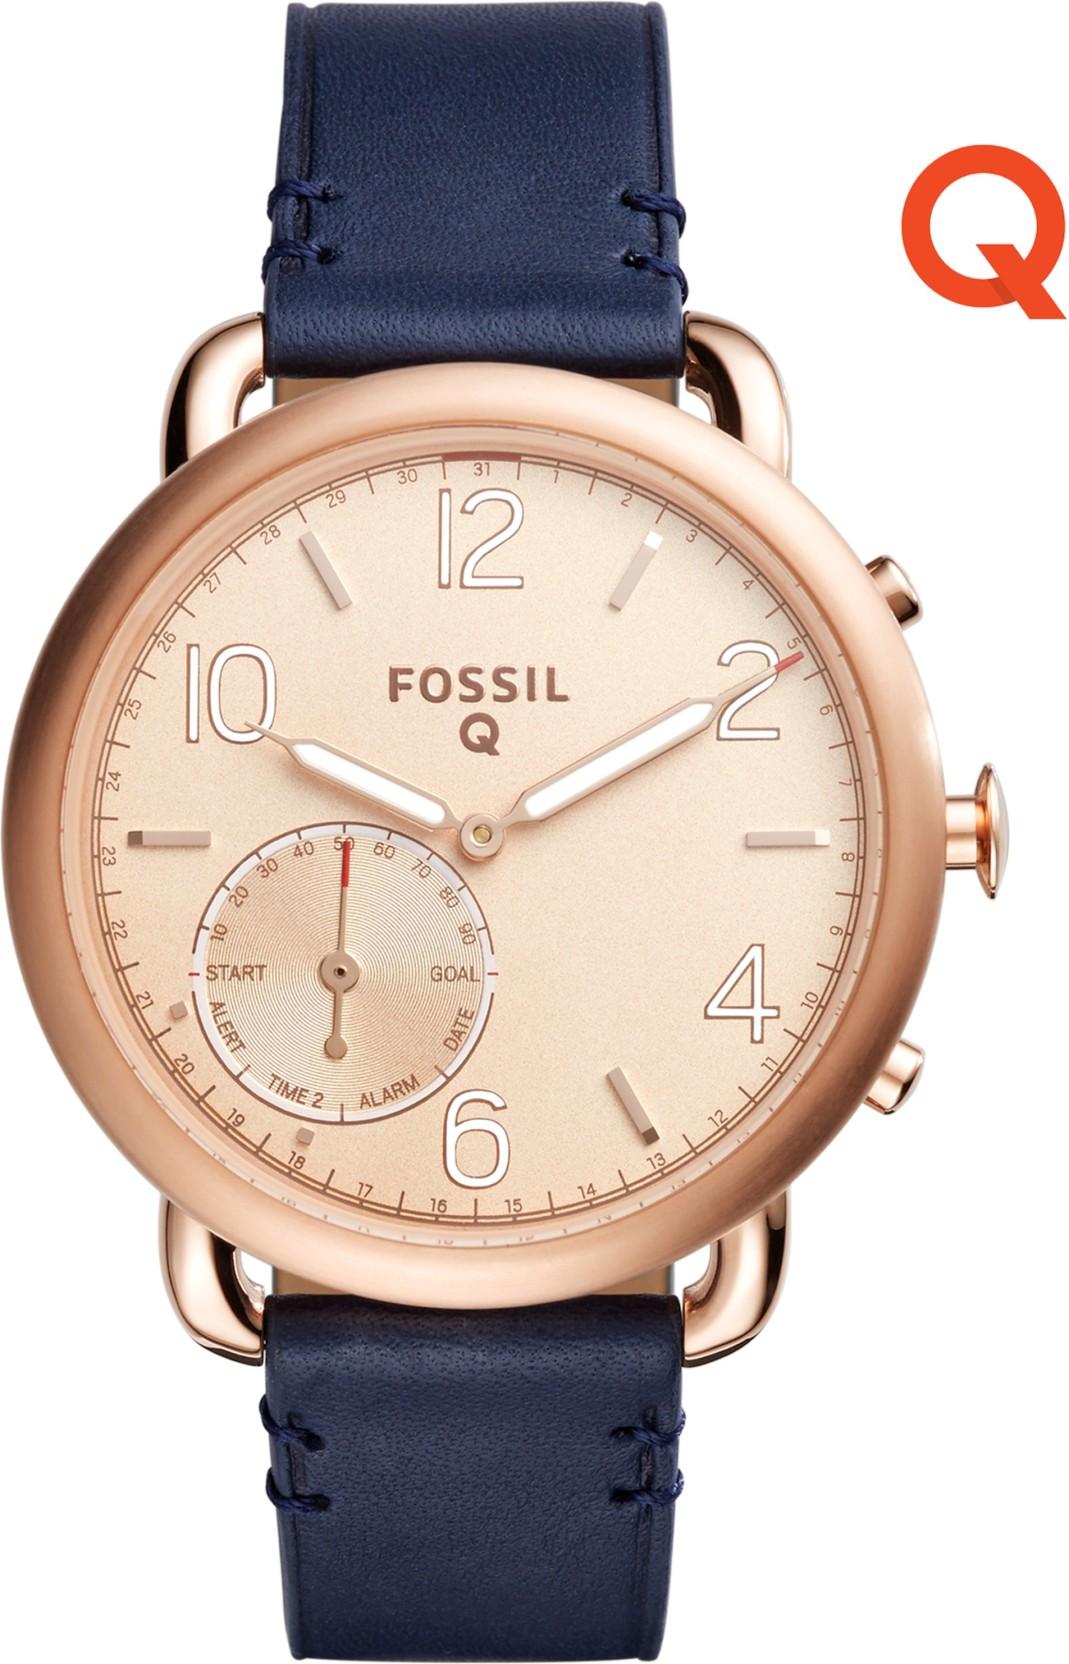 Fossil Gen 1 Smartwatch Q54 Pilot Leather Strap Ftw10051 Daftar Obral Jam Tangan Pria G Shockga1100